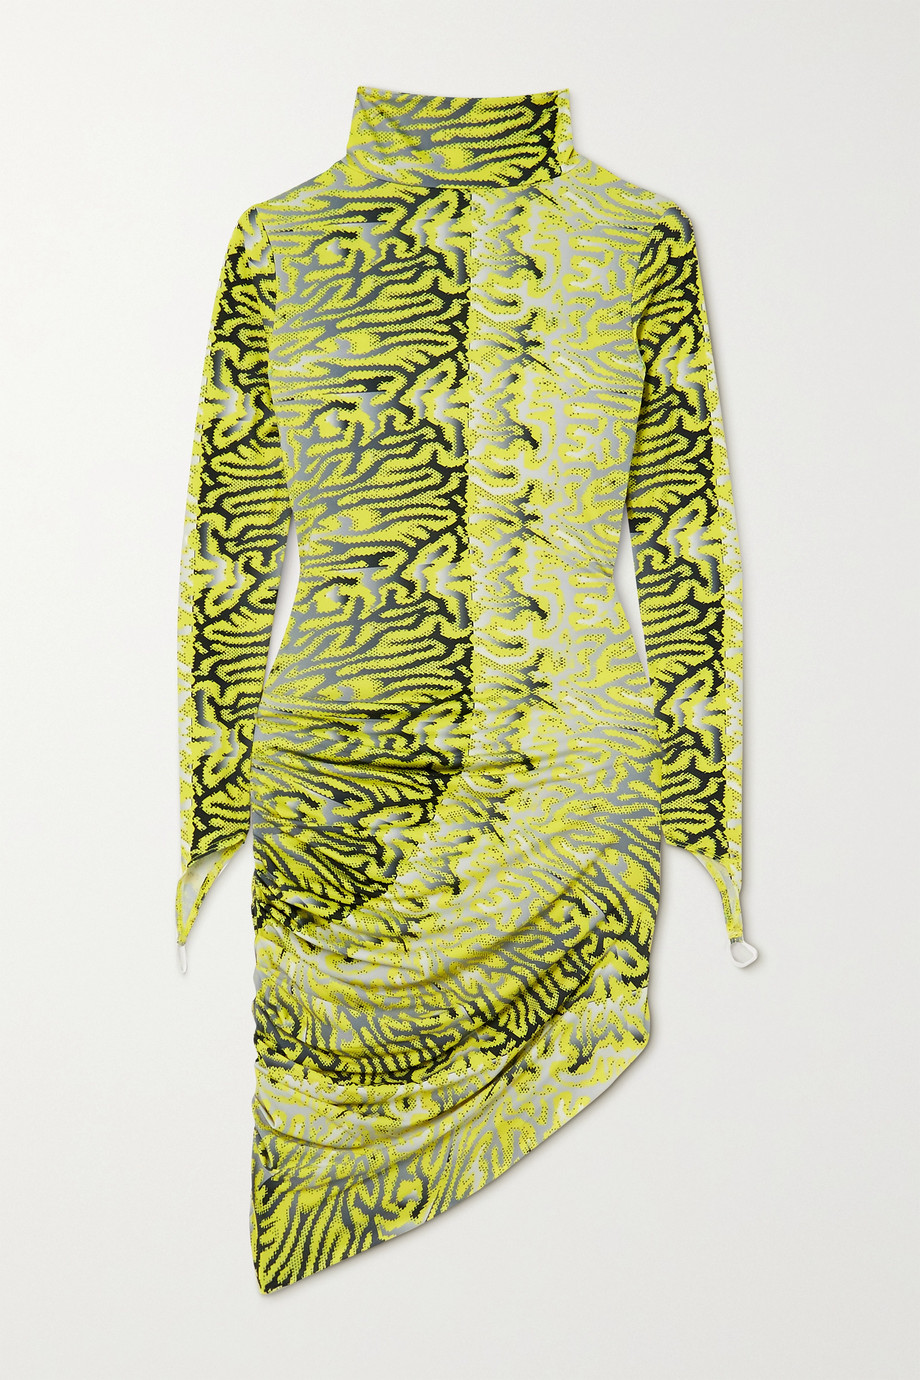 Maisie Wilen Orbit City ruched printed stretch-jersey turtleneck mini dress